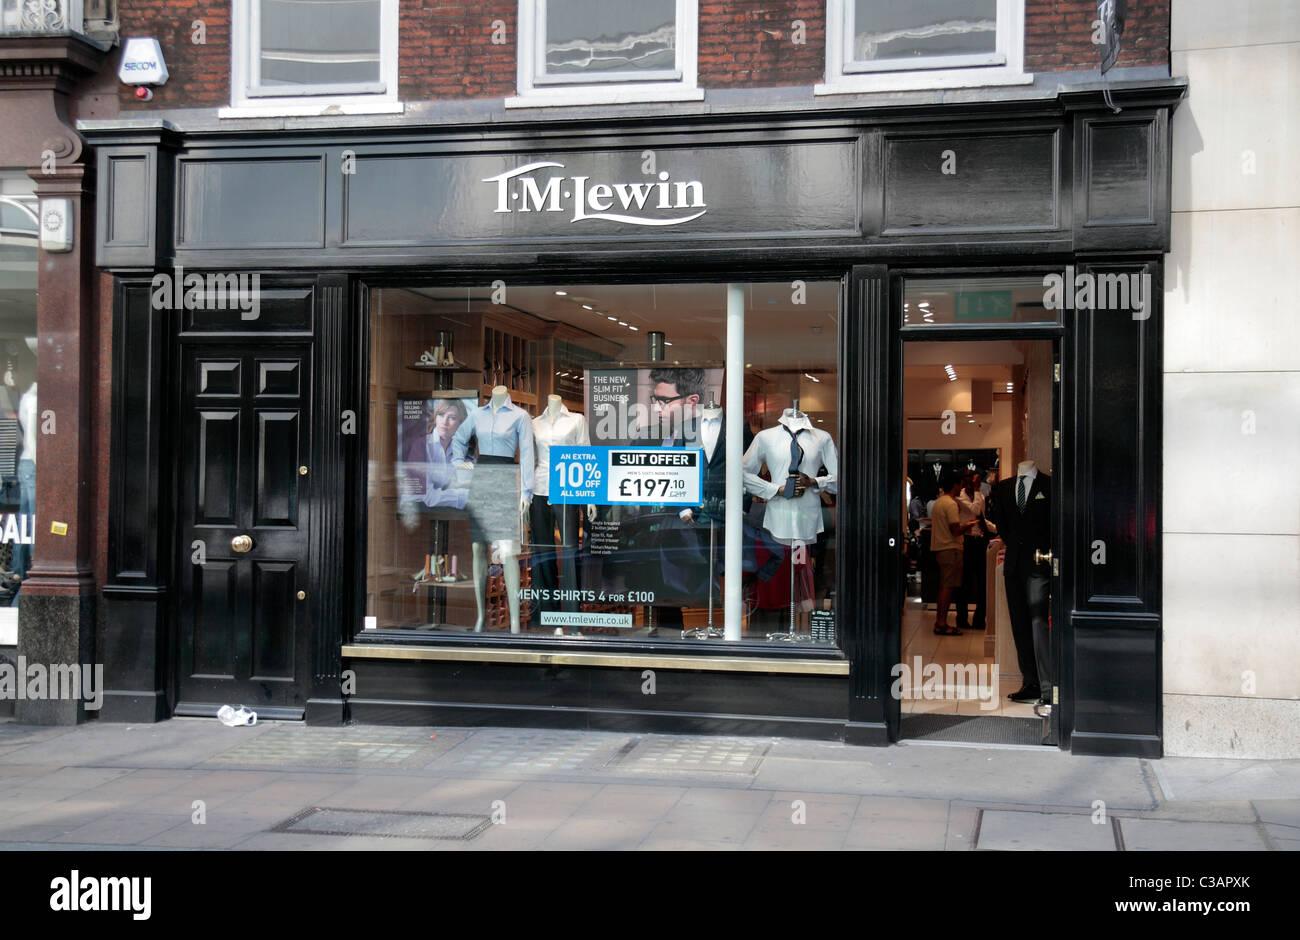 Tm lewin online shopping